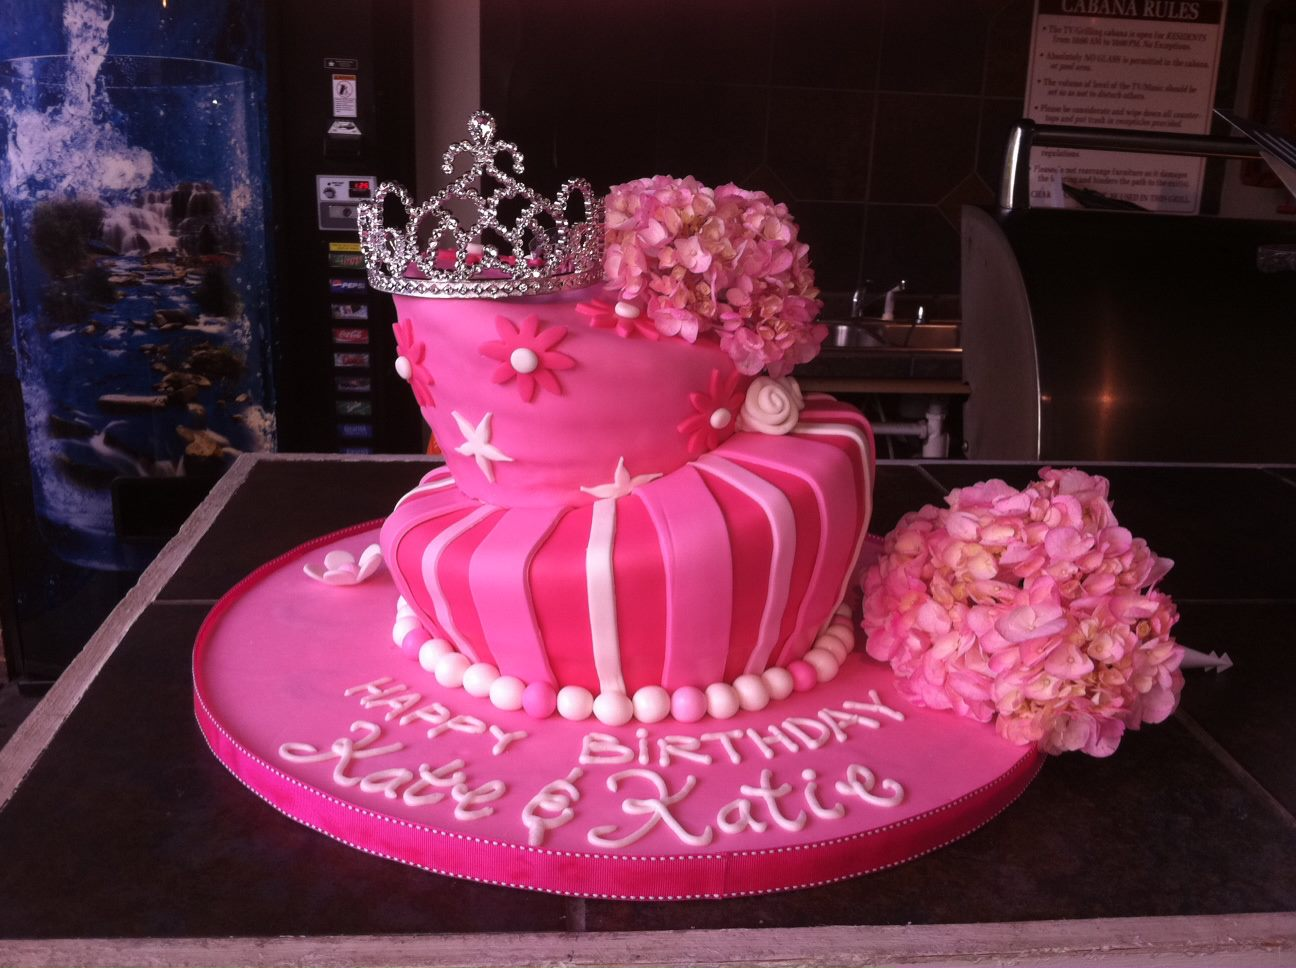 Make Awesome Birthday Cake Image Inspiration of Cake and Birthday